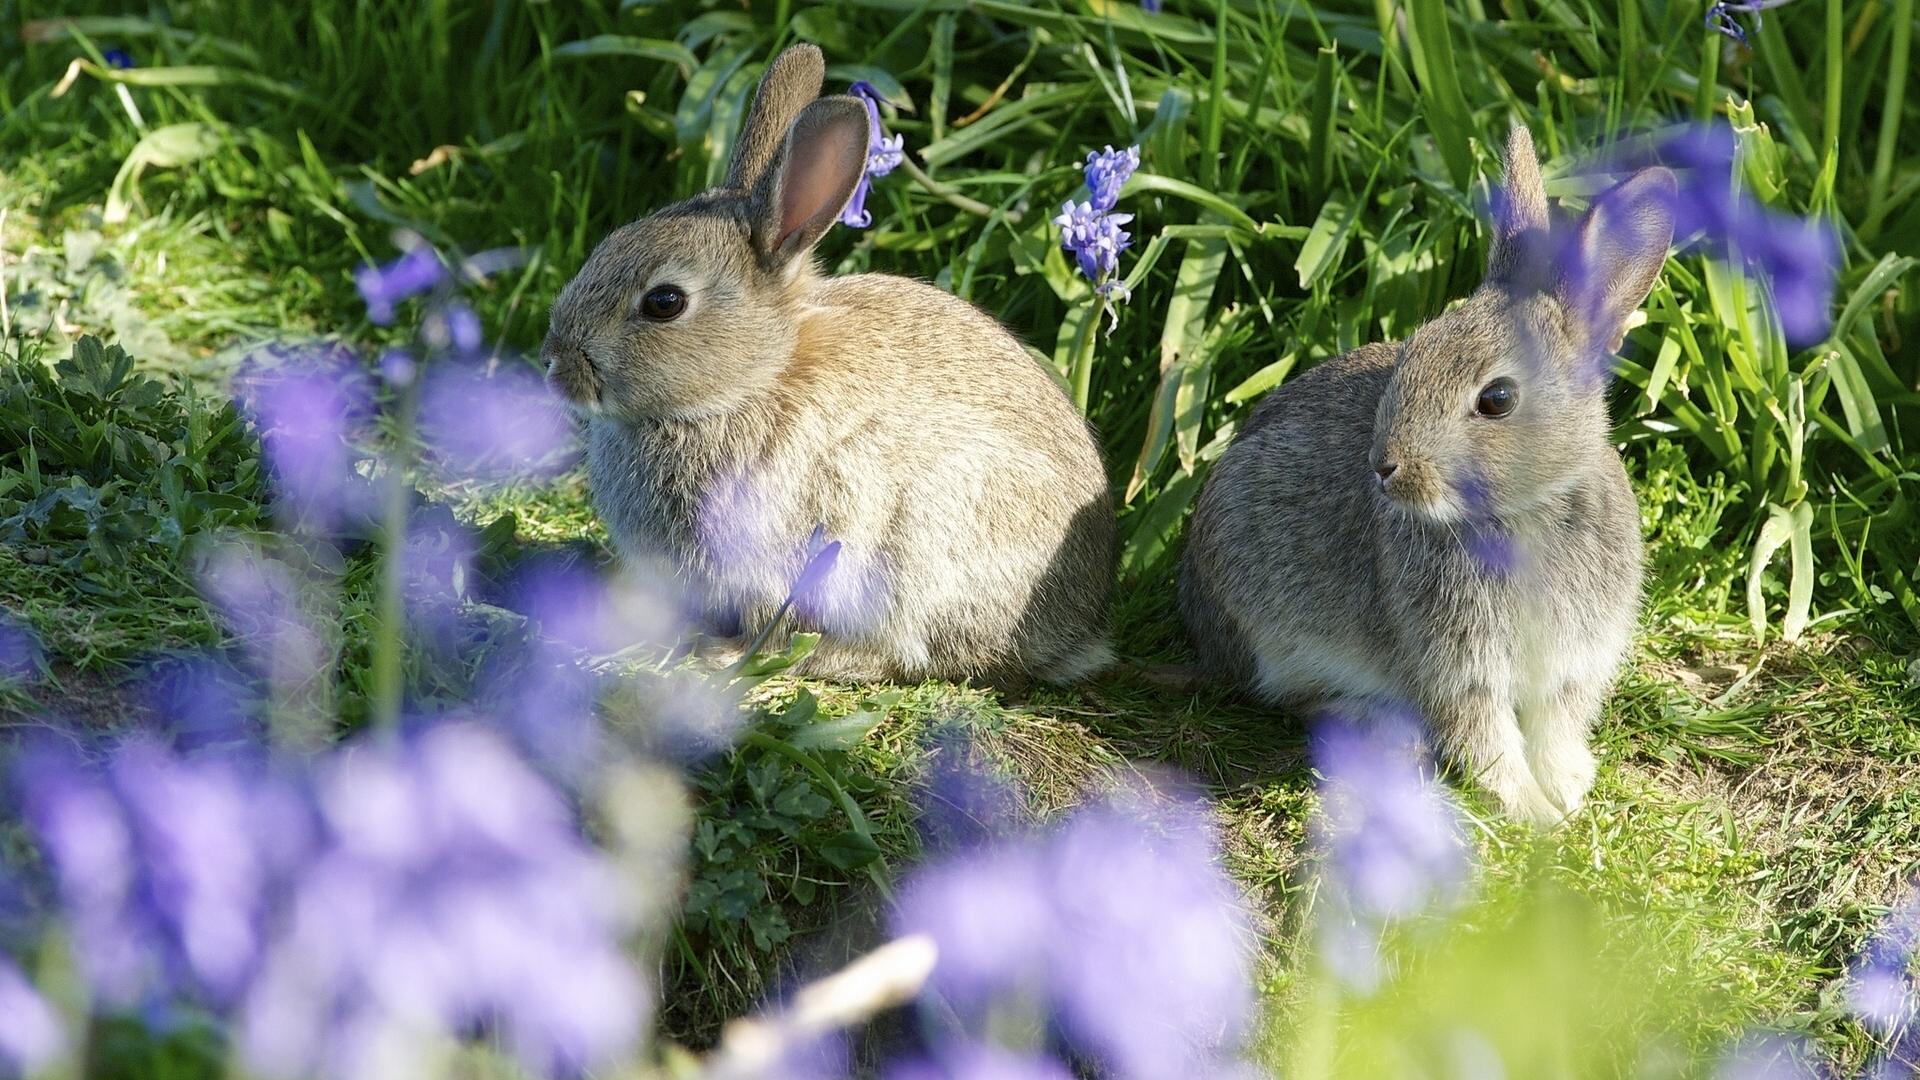 кролик девушка природа животное  № 1594091 бесплатно